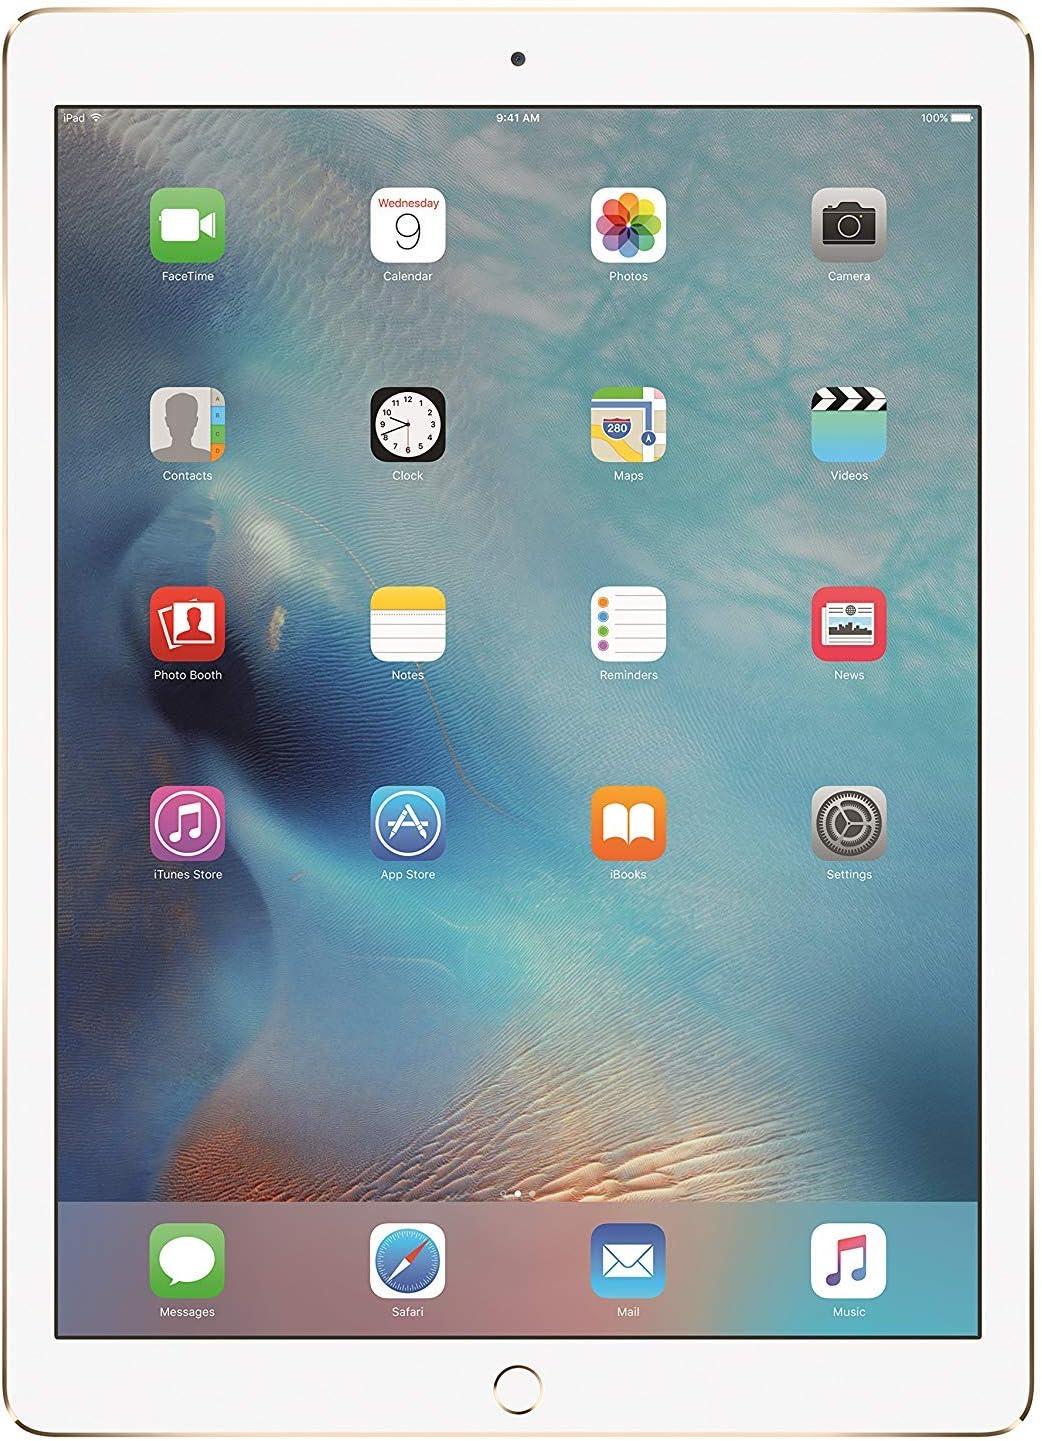 APPLE MQDD2LL/A iPad Pro with Wi-Fi 64GB, 12.9in, Gold (Renewed)